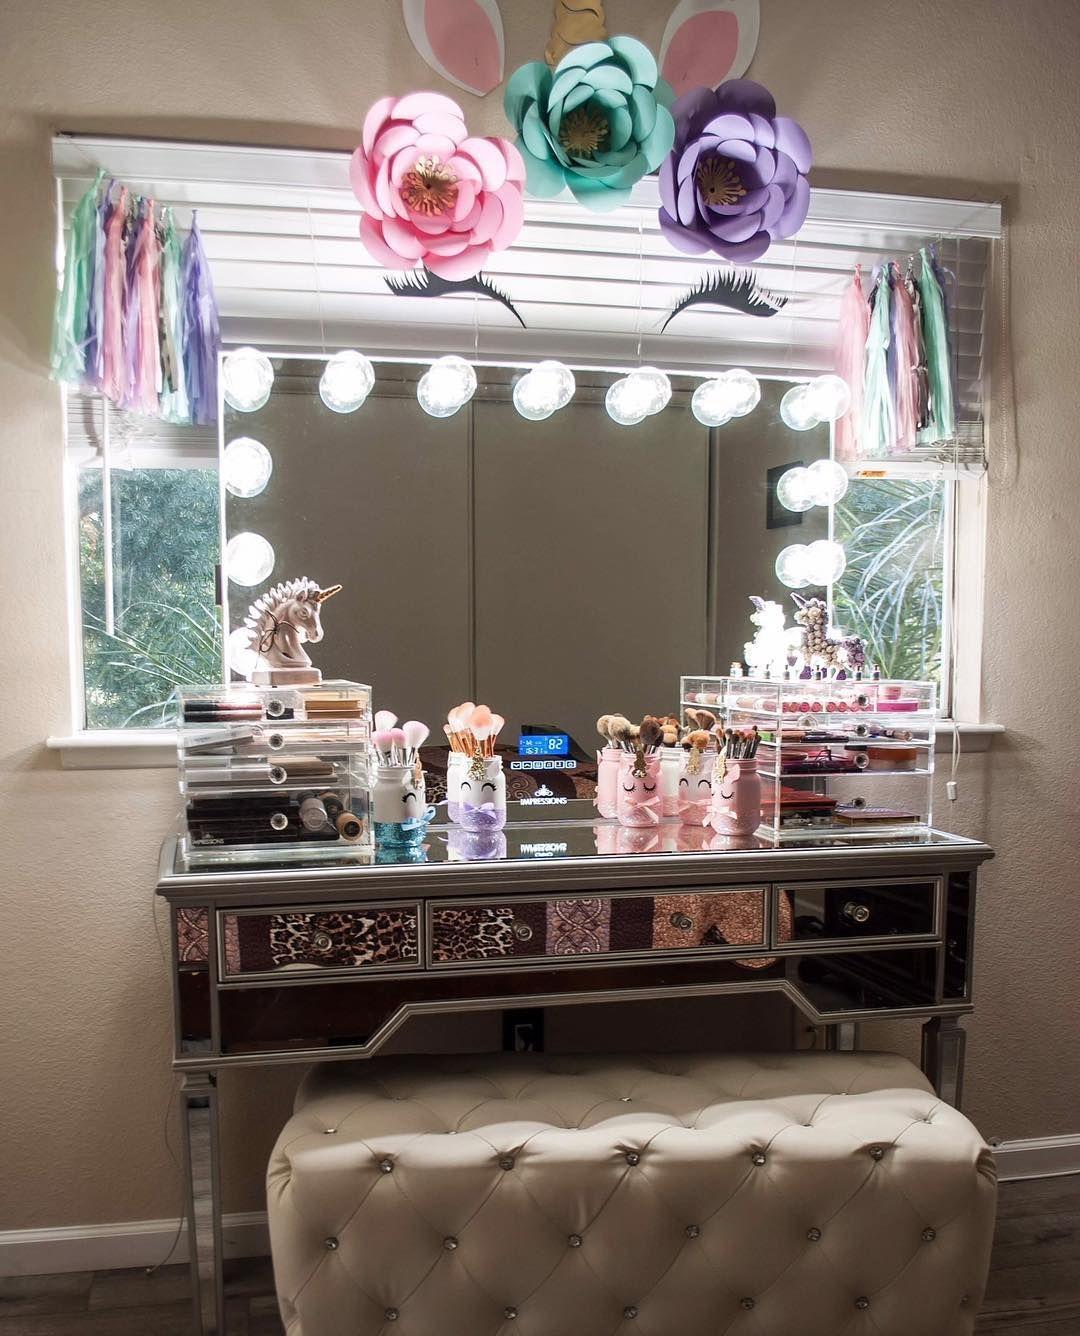 Pin on Makeup Organization IdeasBag, Case & Vanity